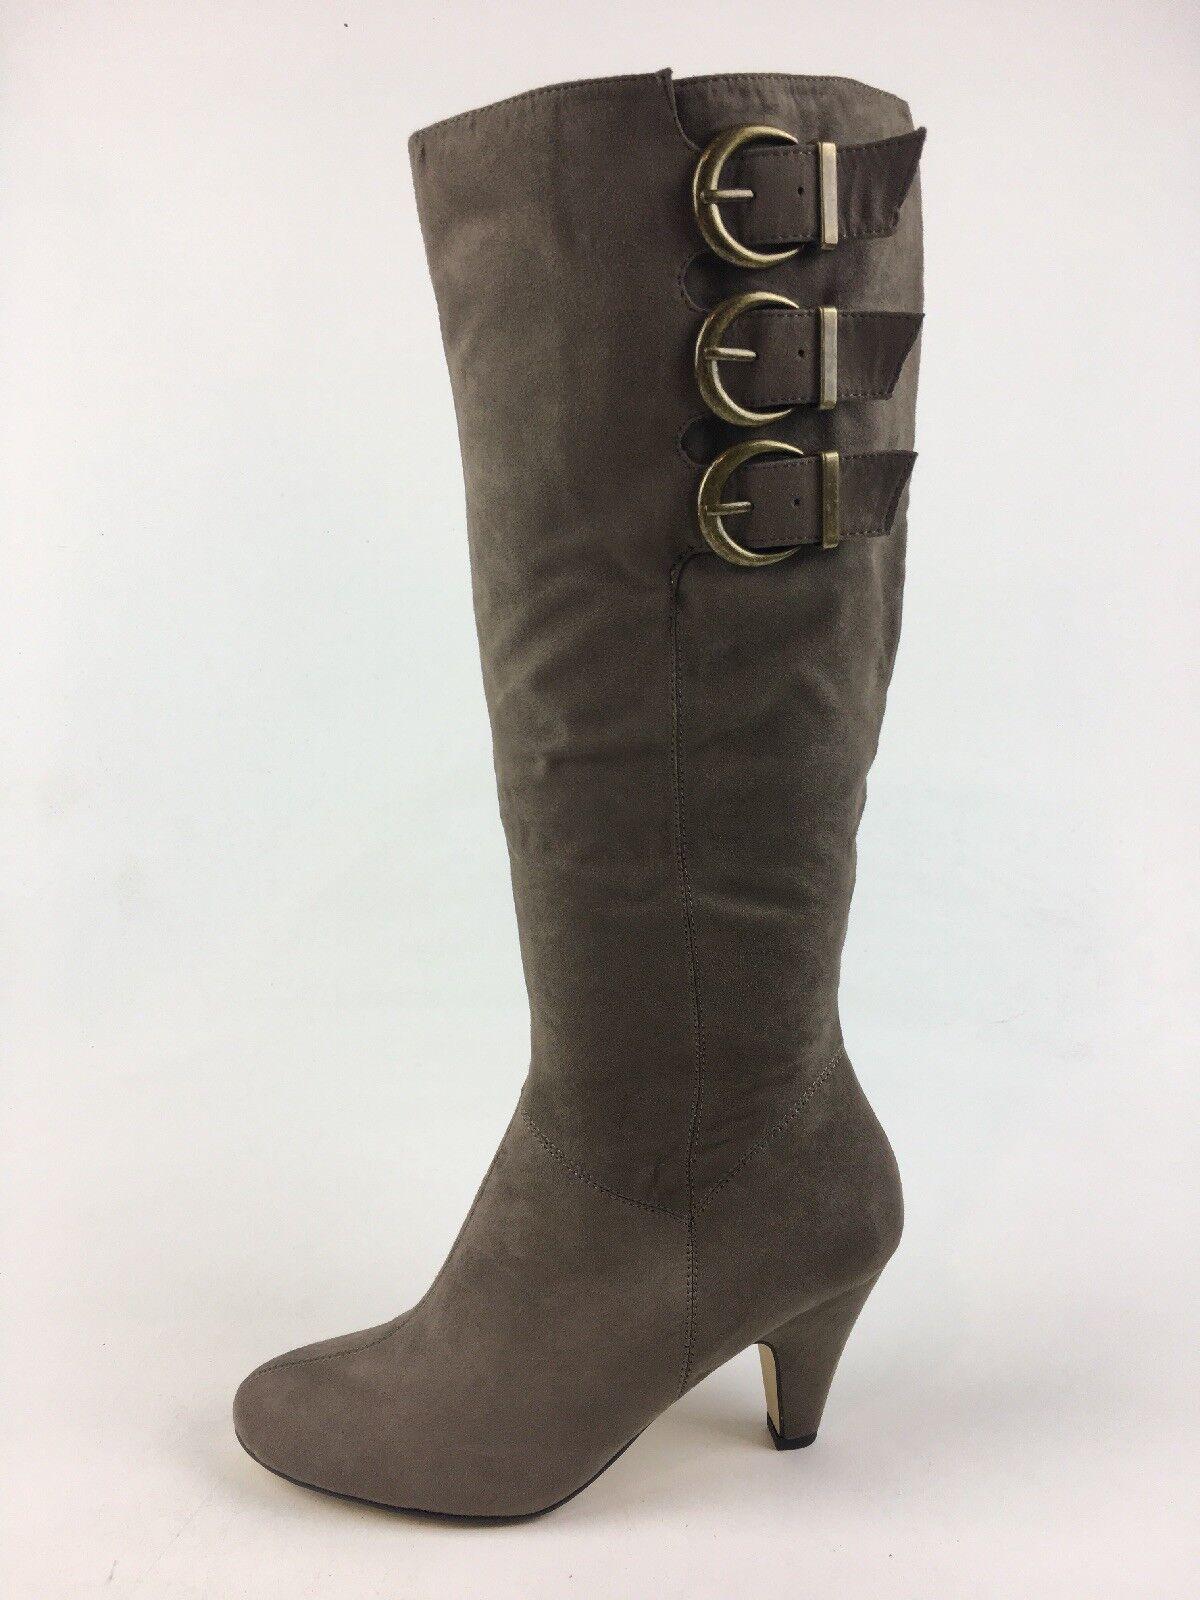 Bella Vita Transit II Knee High Boot Size 7M, Grey Fabric 1219